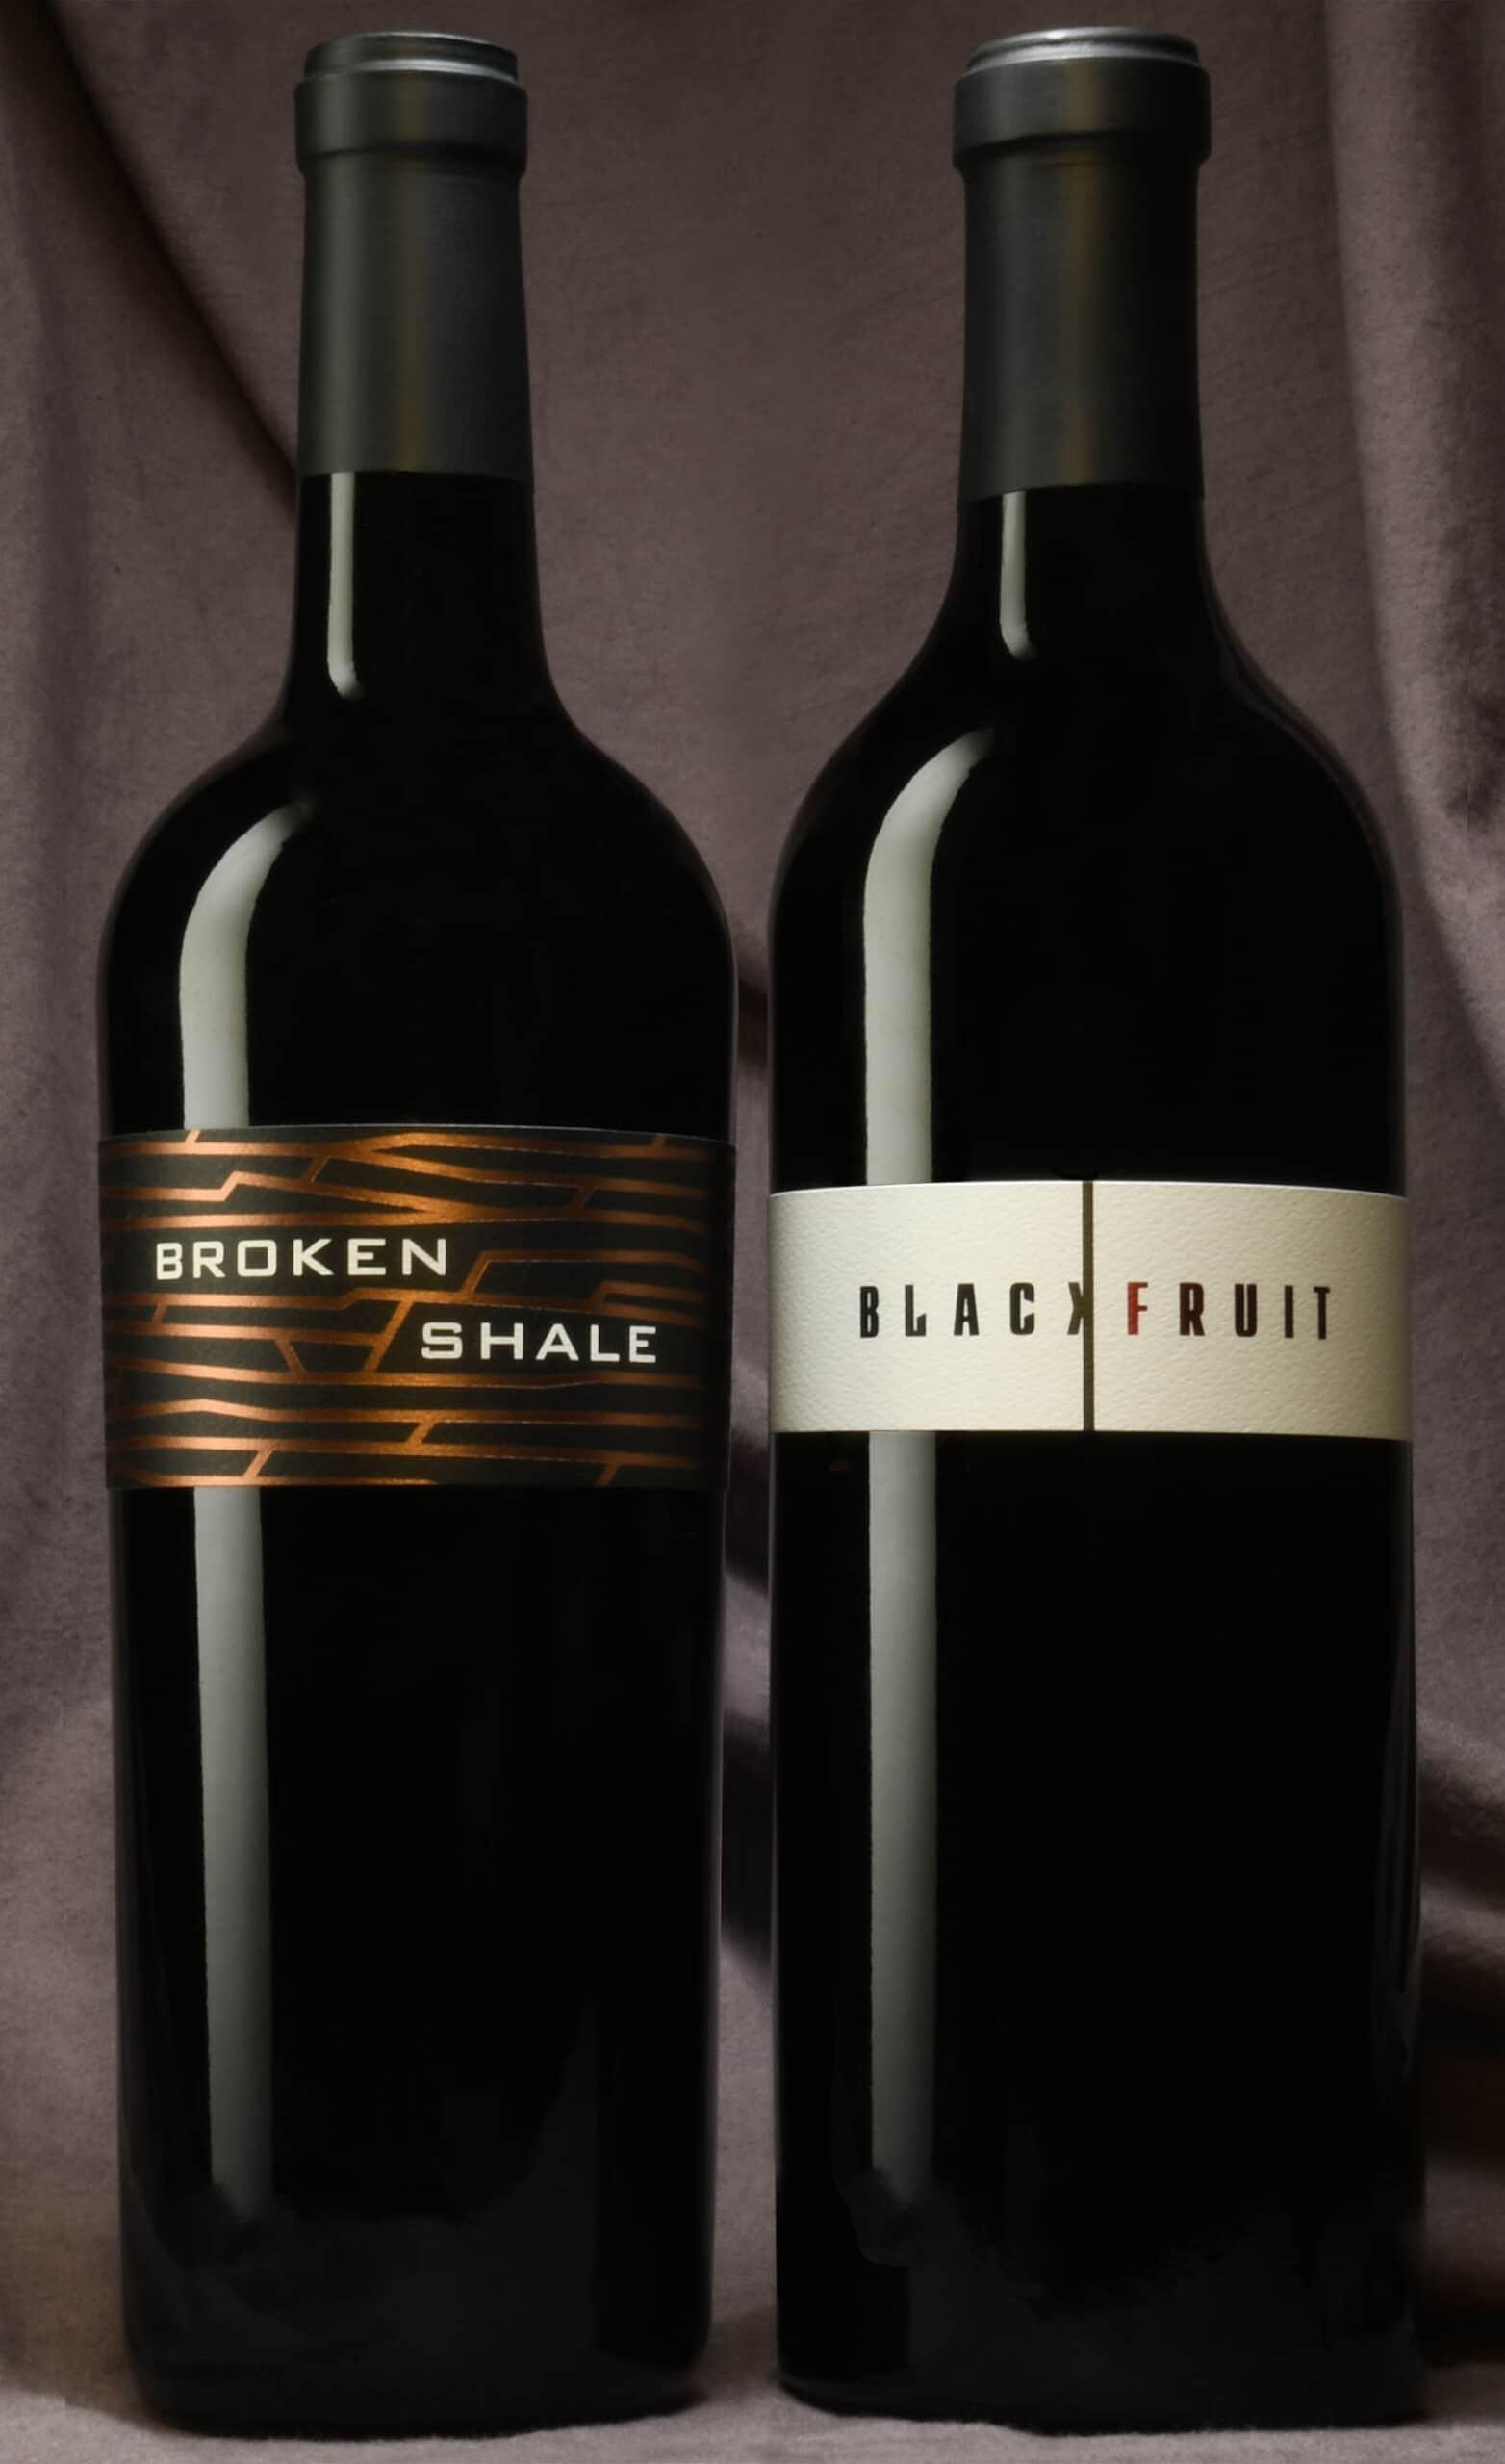 Cardano wine bottles